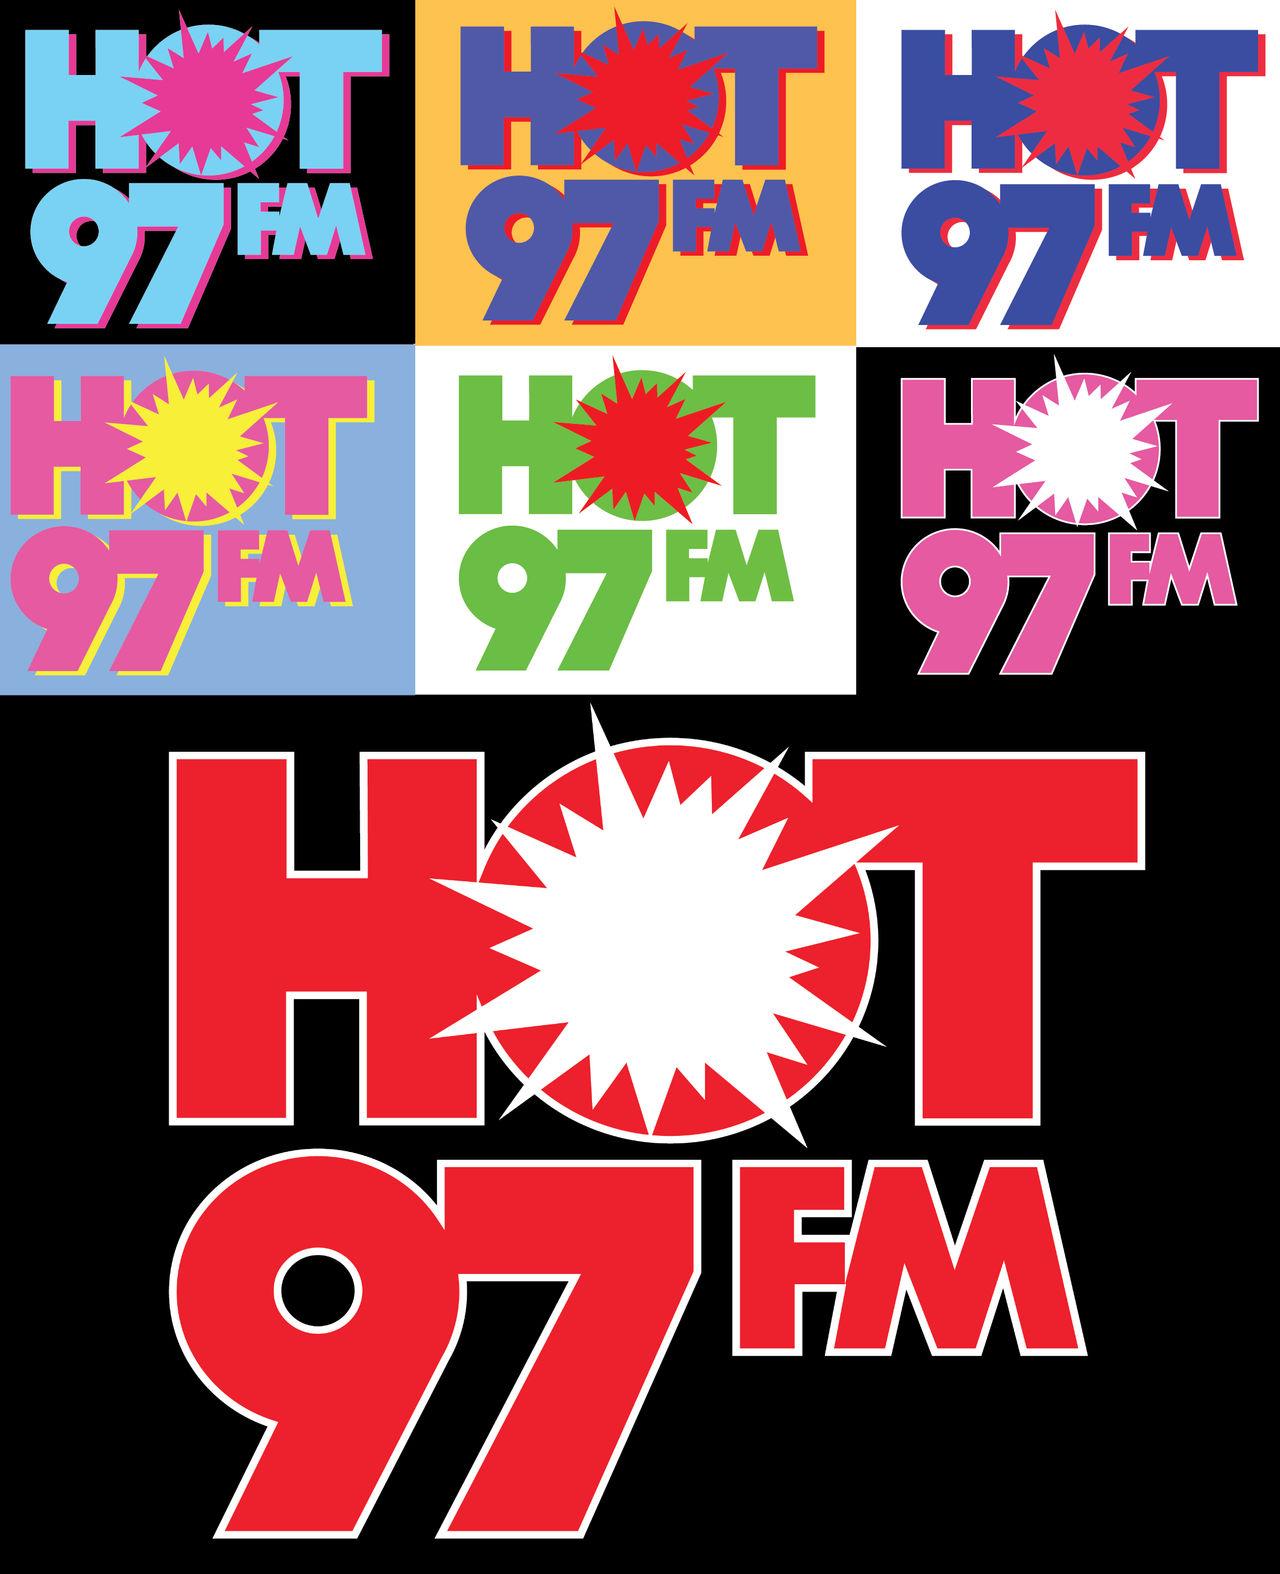 hot 97 logo by sonicteambronx